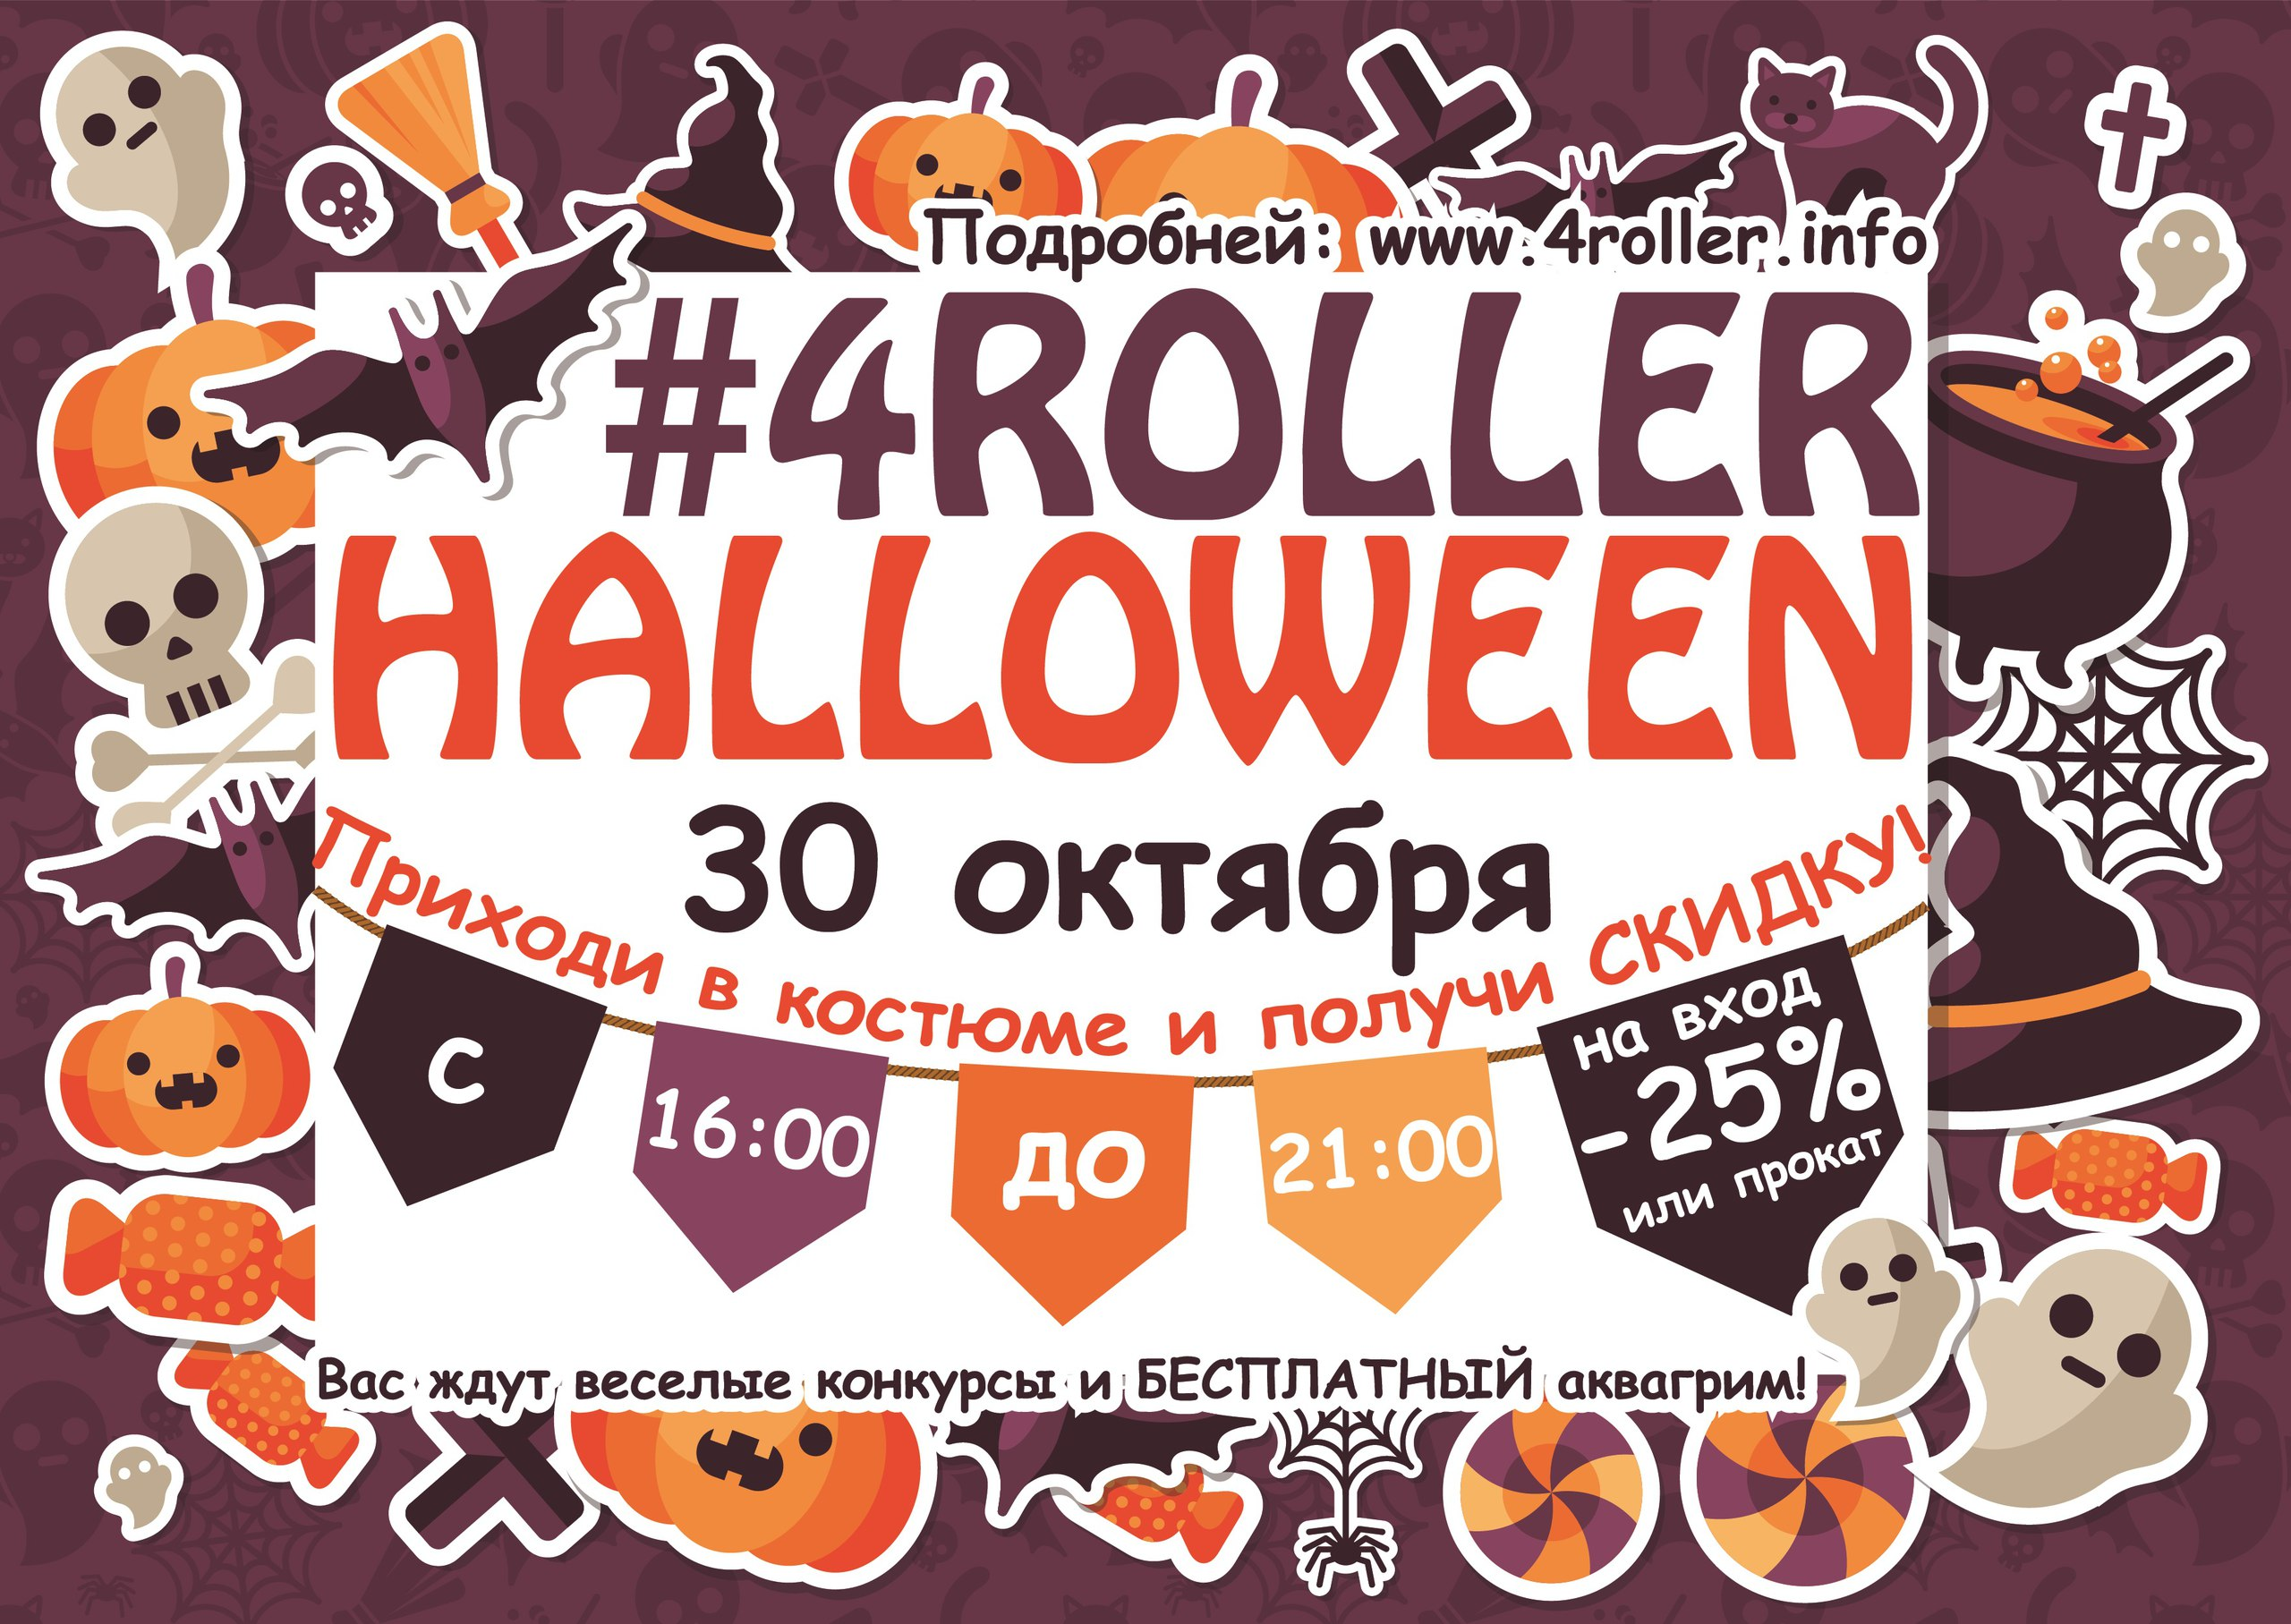 30.10.16 Праздноваение Halloween'a на Роллердроме #4rollerinfo